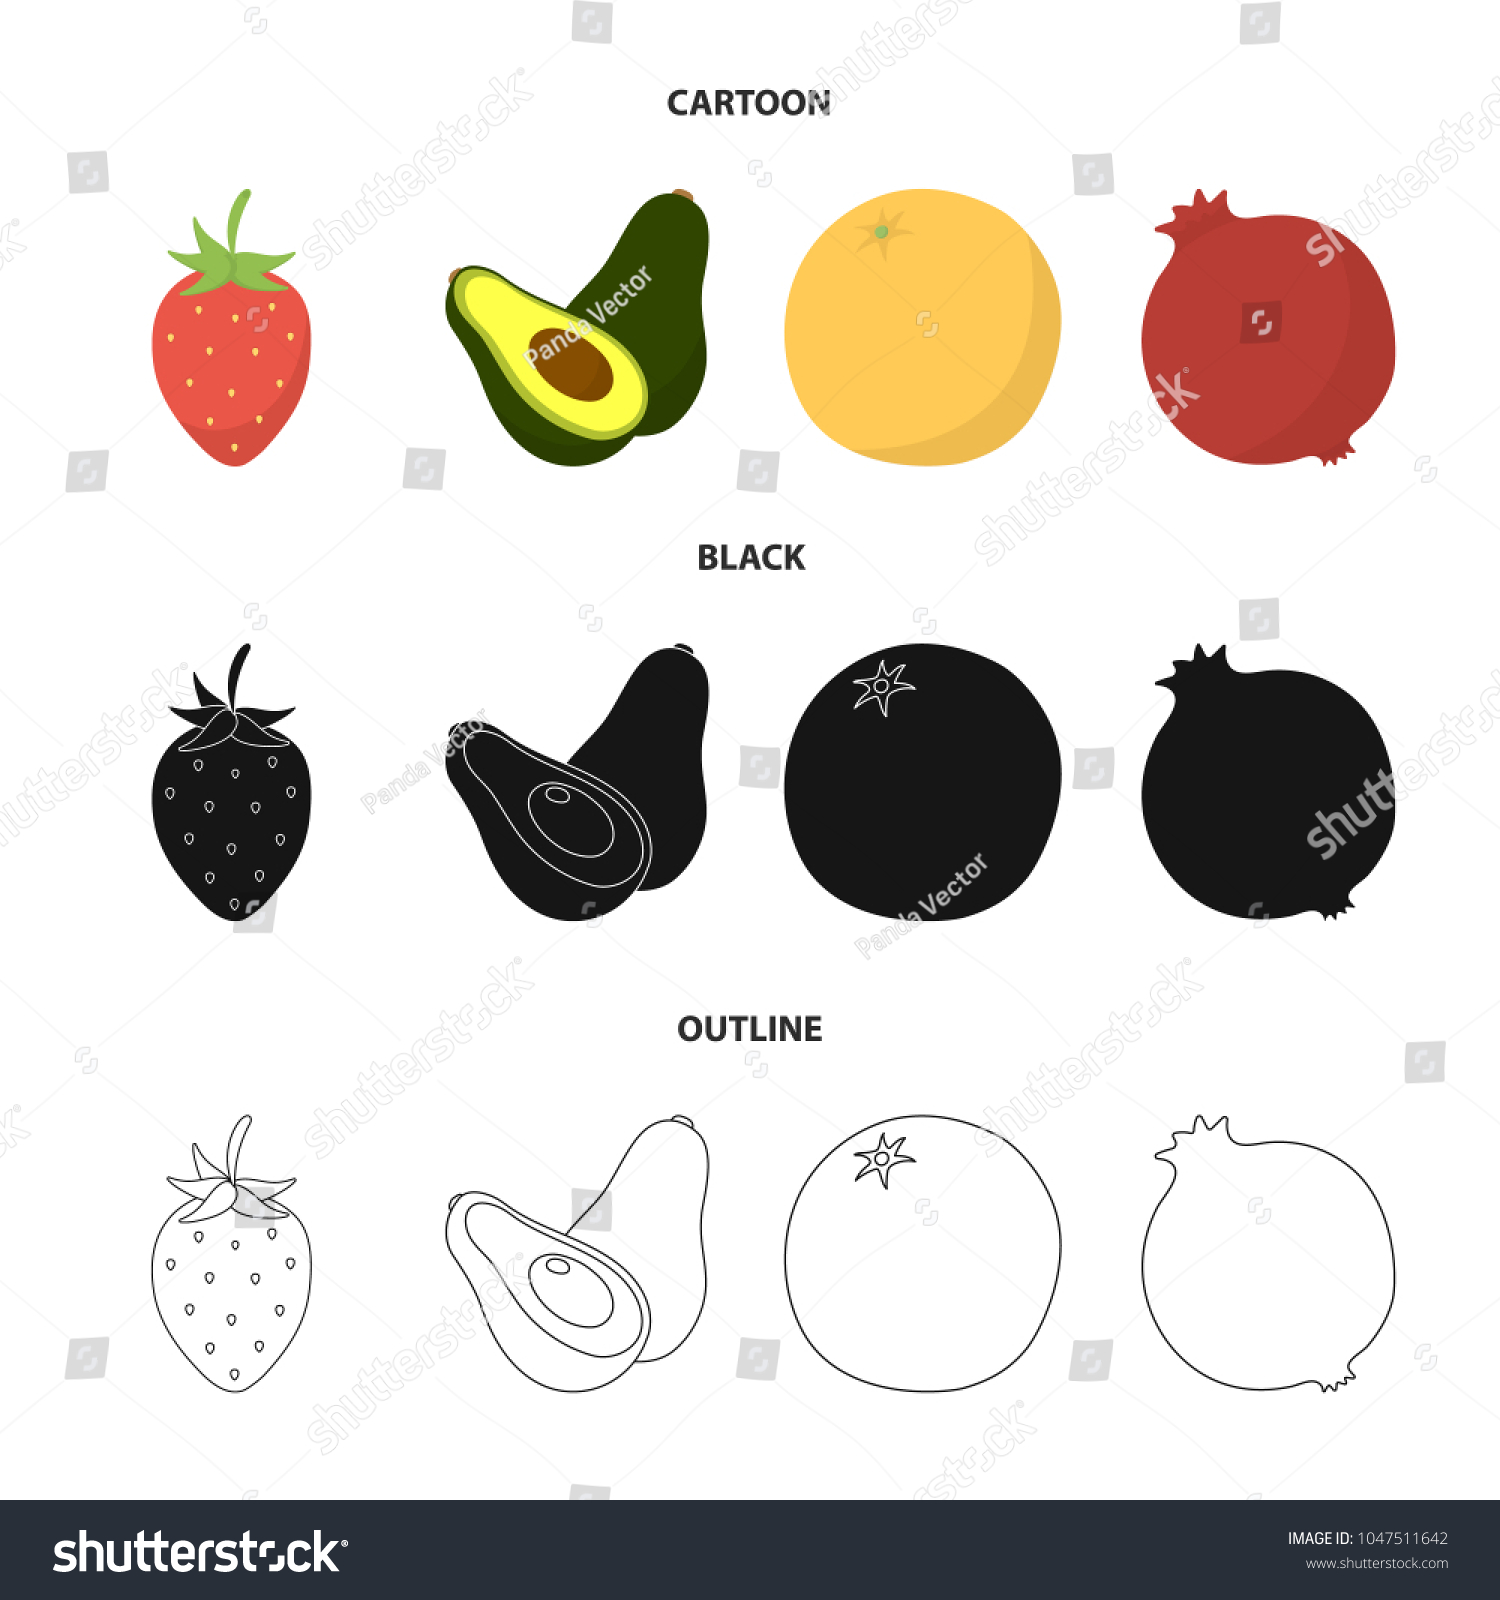 Strawberry Berry Avocado Orange Pomegranate Fruits Set Stock Vector Plant Diagram Pomegranatefruits Collection Icons In Cartoon